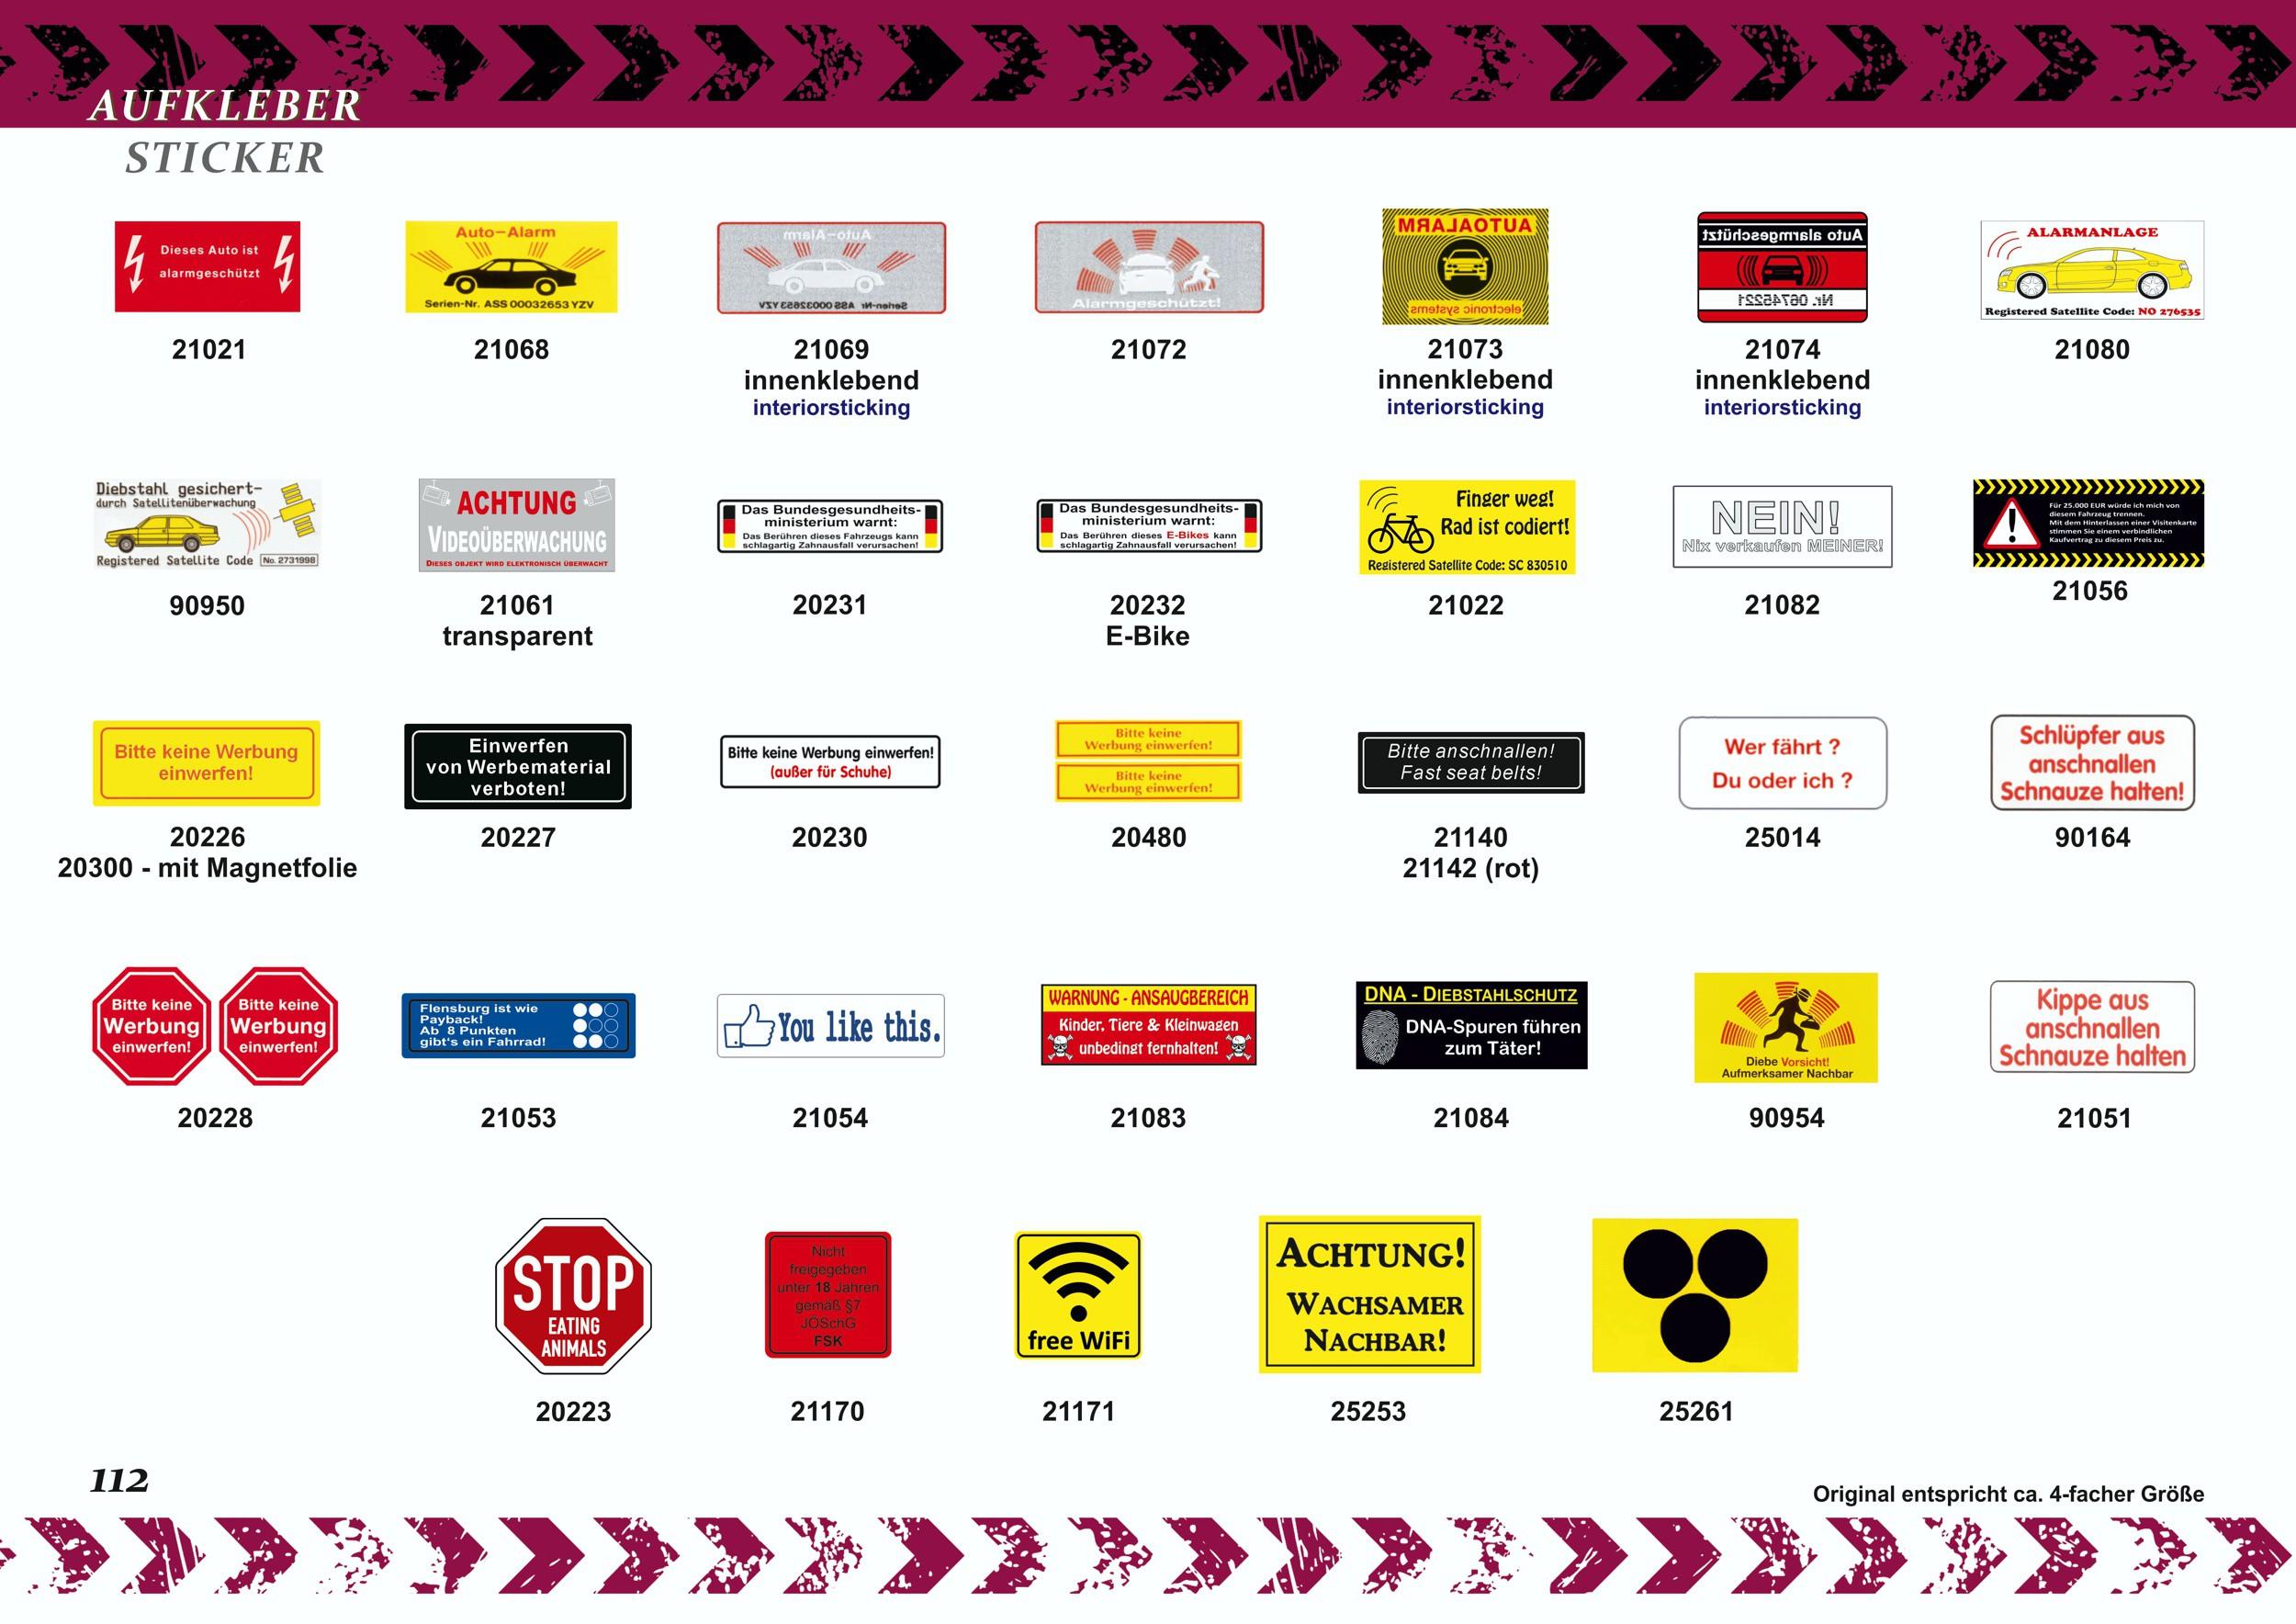 Aufkleber Autoalarm - electronic systems innenklebend – Bild 5